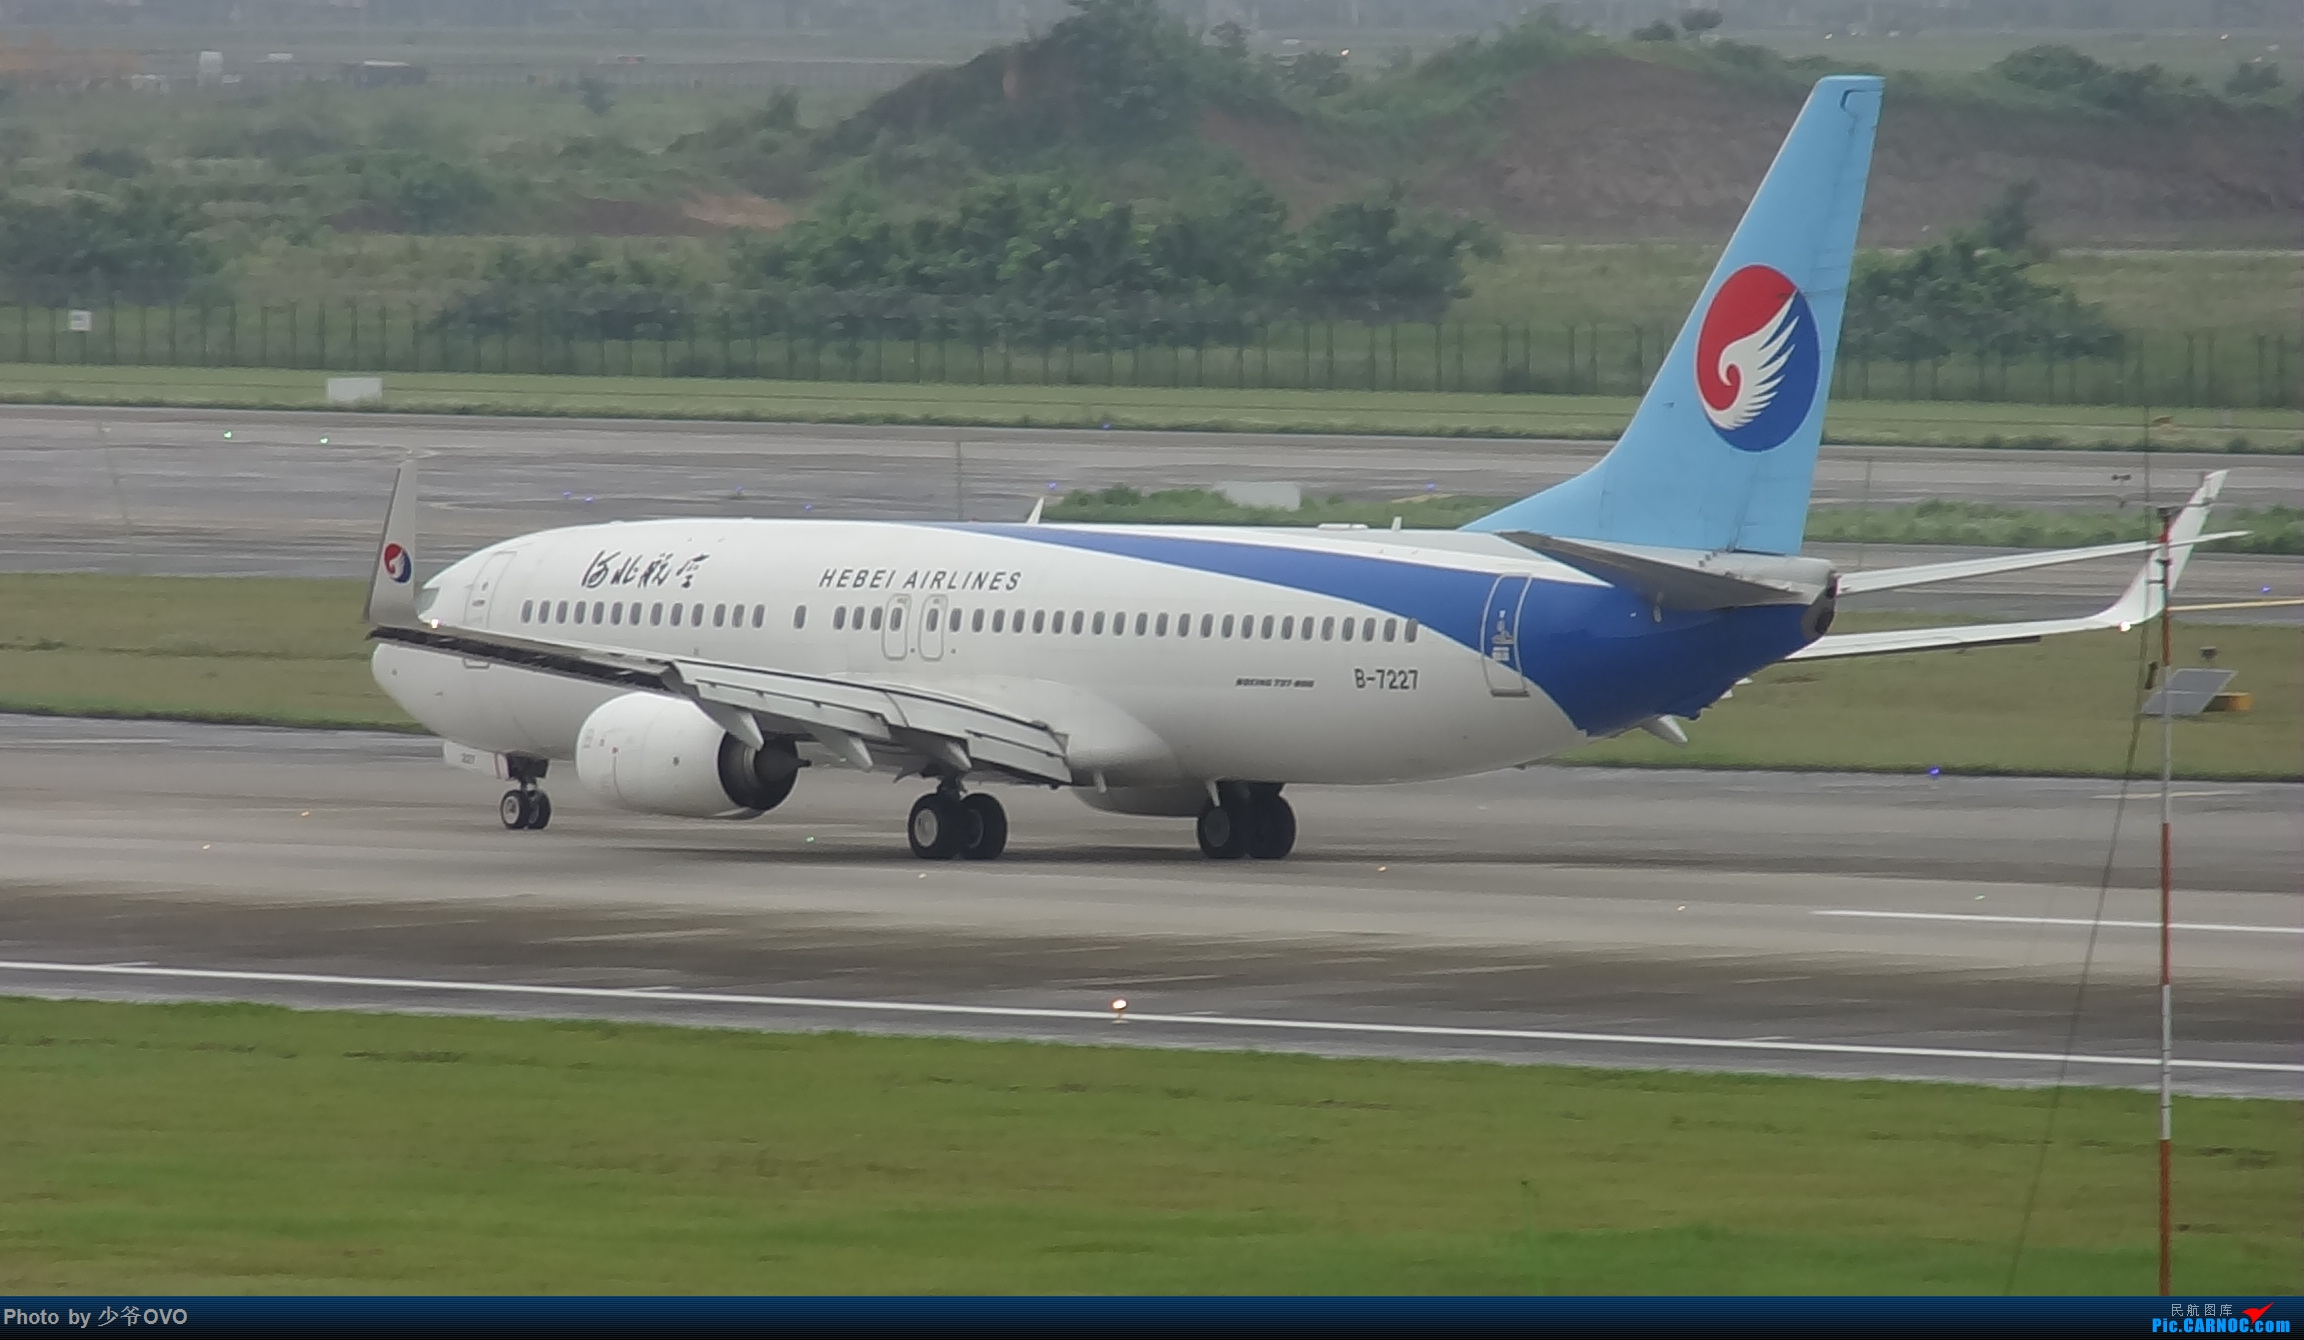 Re:[原创]CKG重庆江北机场拍机 ,中法建交50周年 BOEING 737-800 B-7227 中国重庆江北国际机场